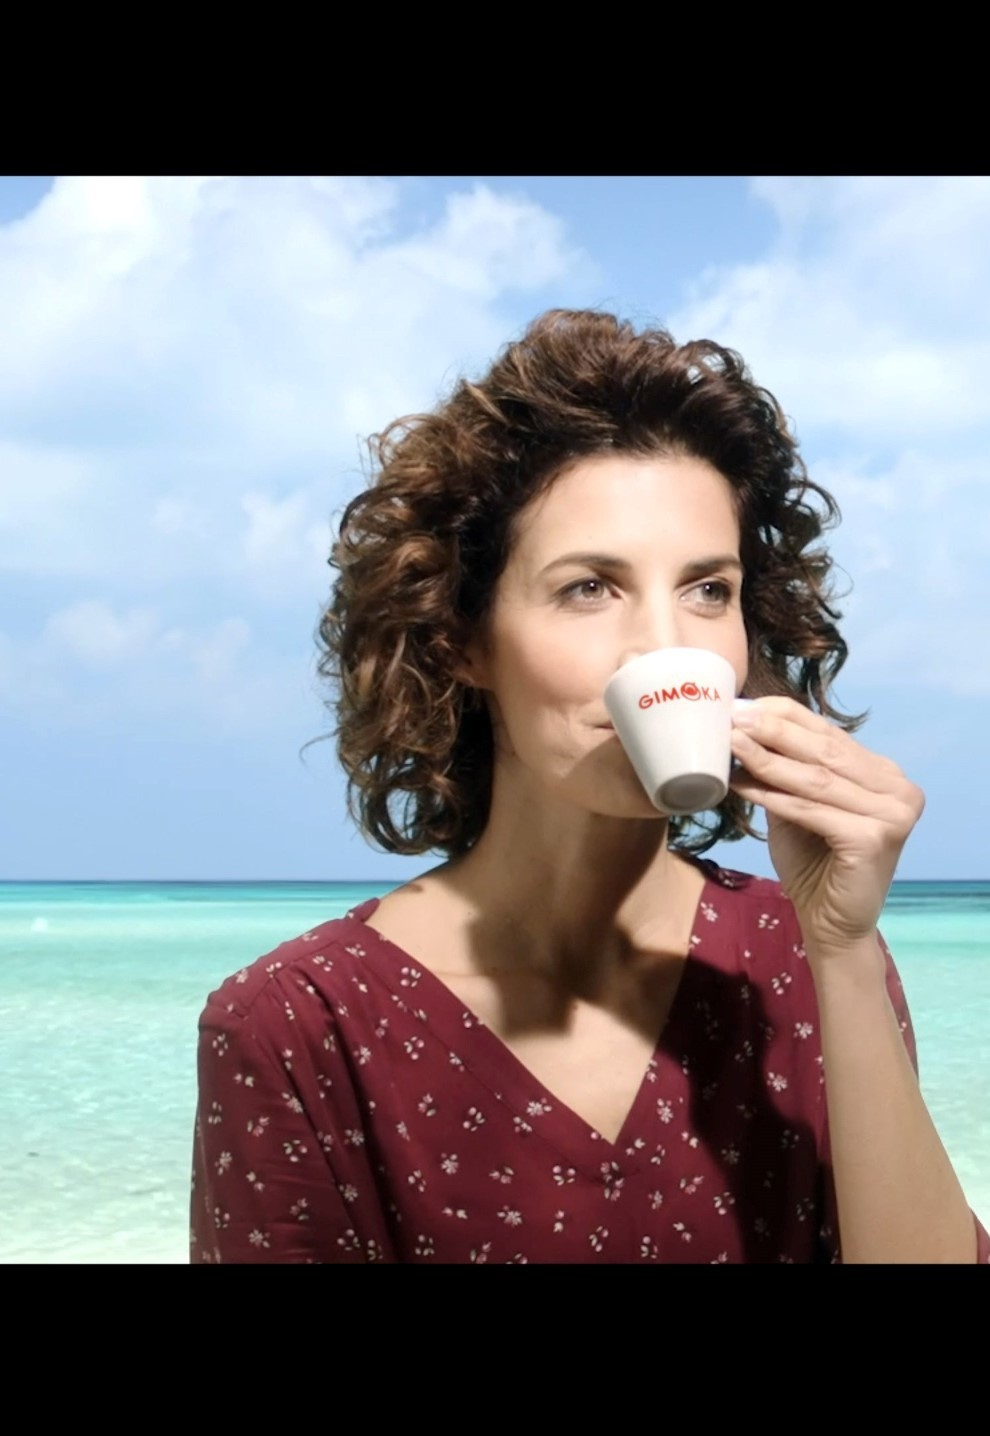 Gimoka torna on air sulle reti Rai, Mediaset e Sky